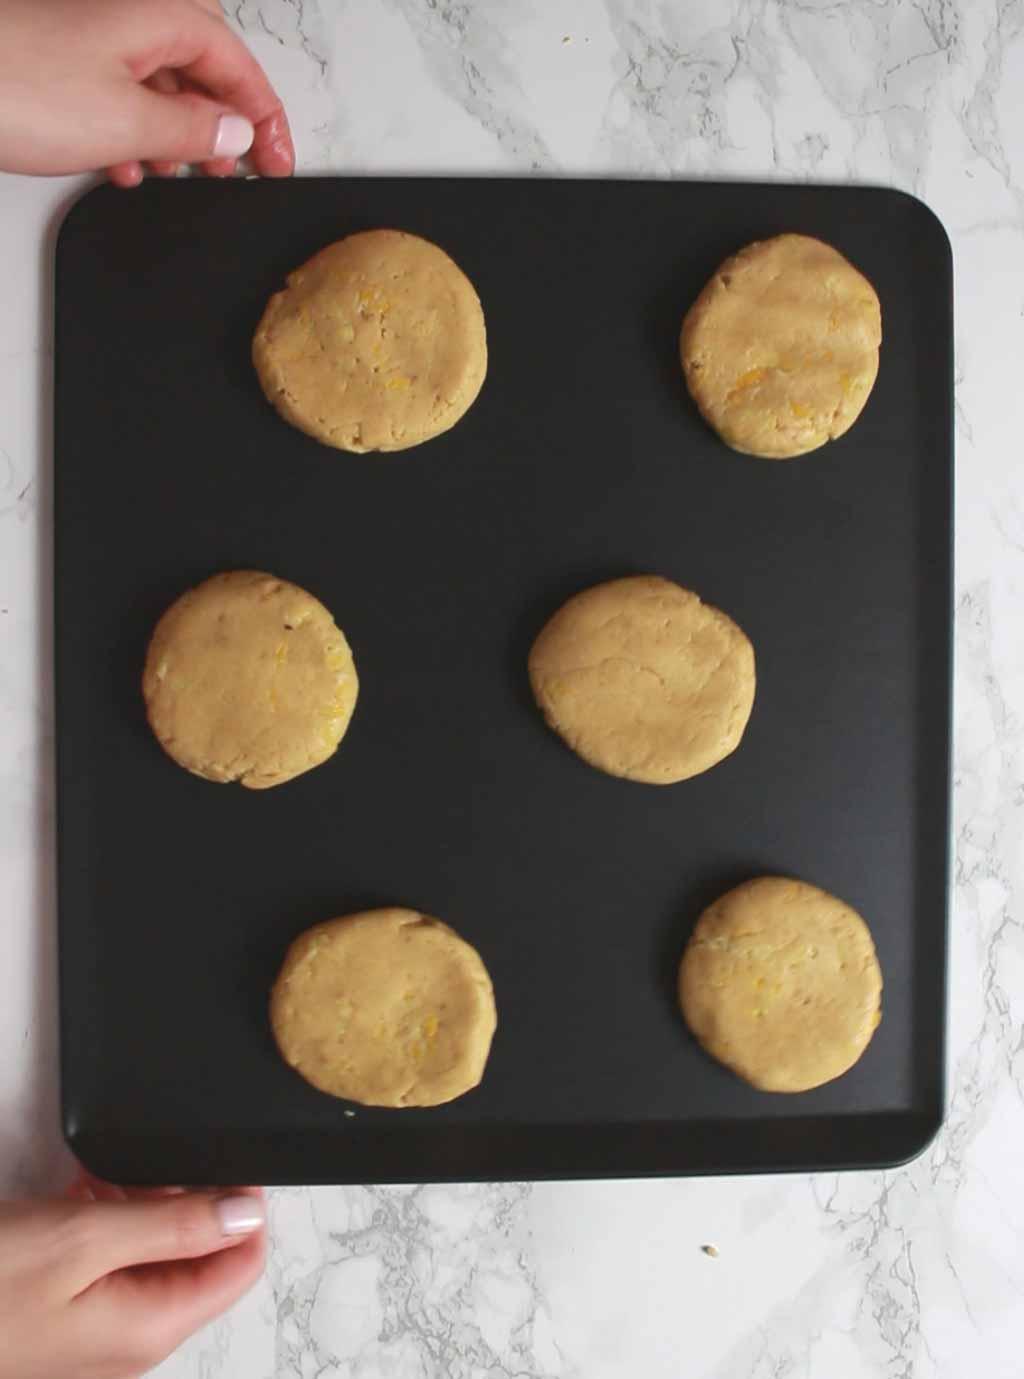 lemon Cookie Dough Discs On Tray Before Baking